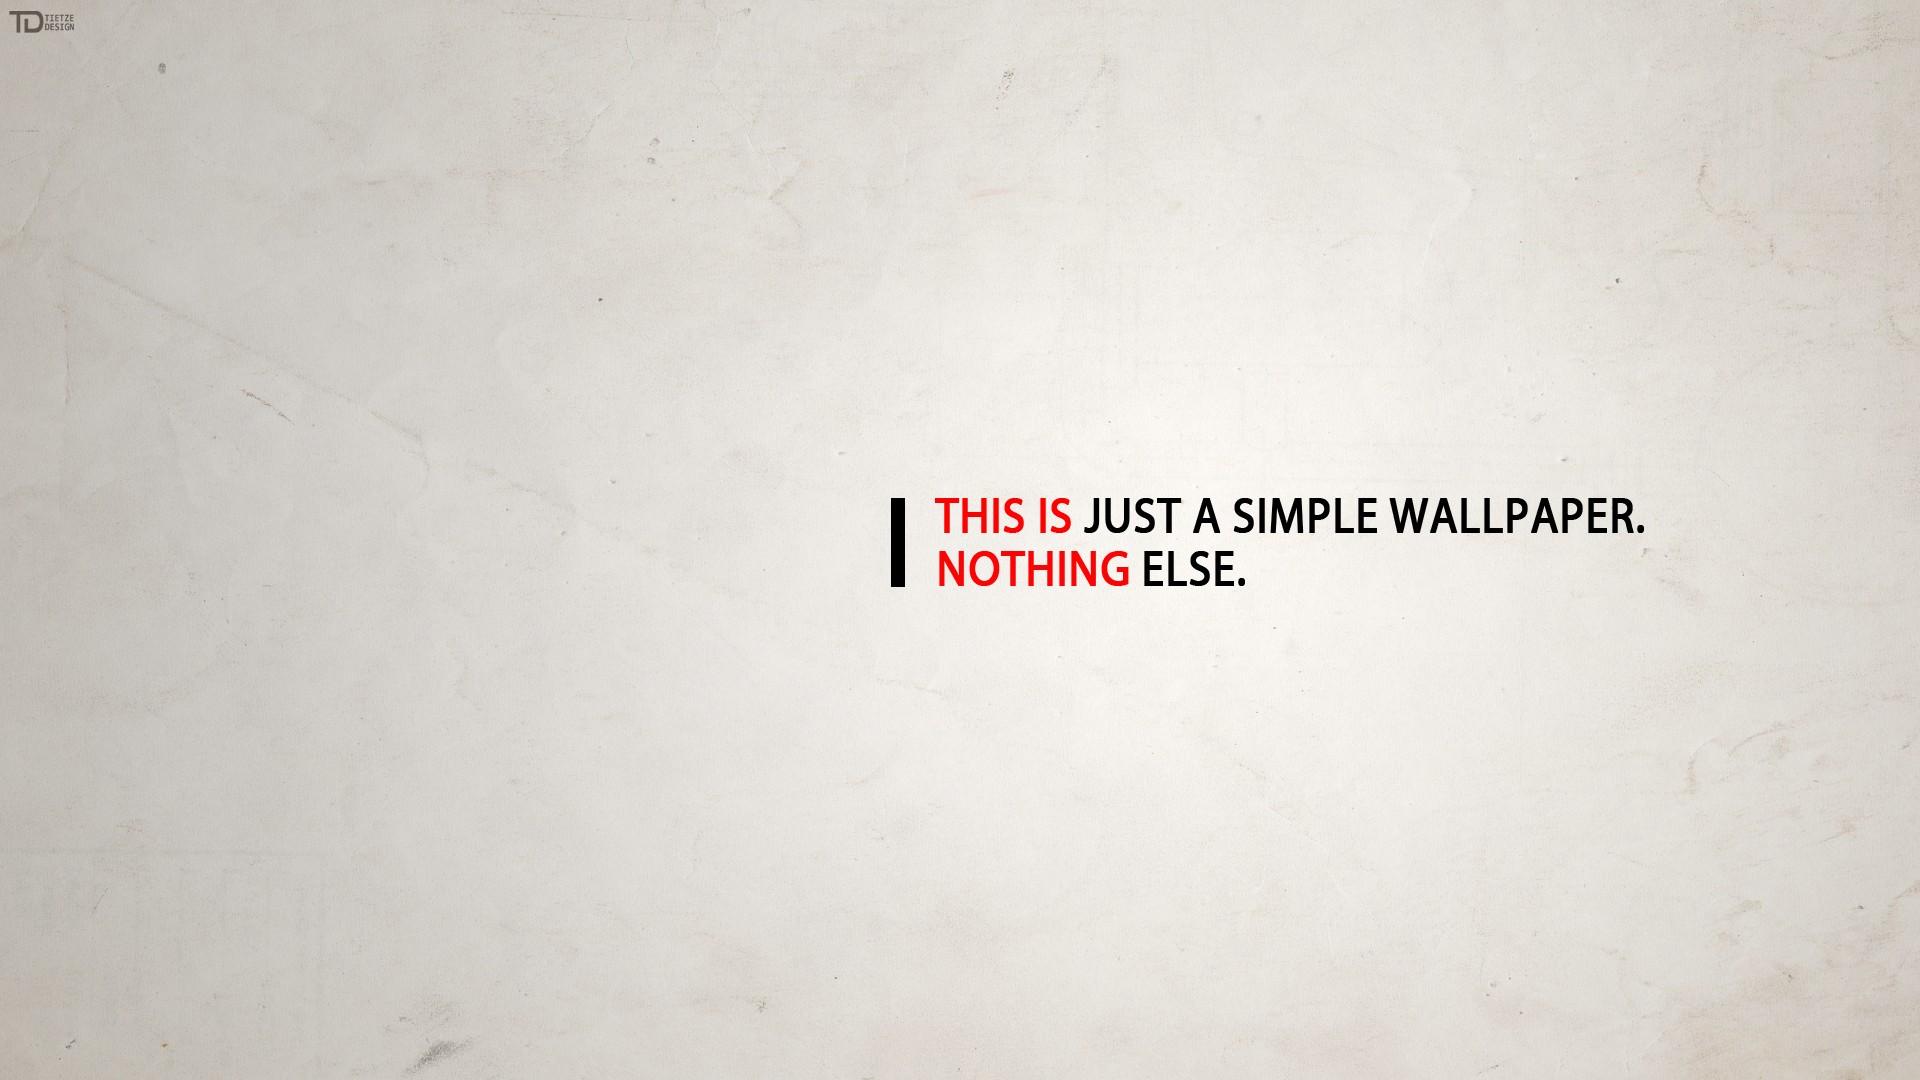 Just A Simple Wallpaper HD Wallpaper FullHDWpp   Full HD Wallpapers 1920x1080